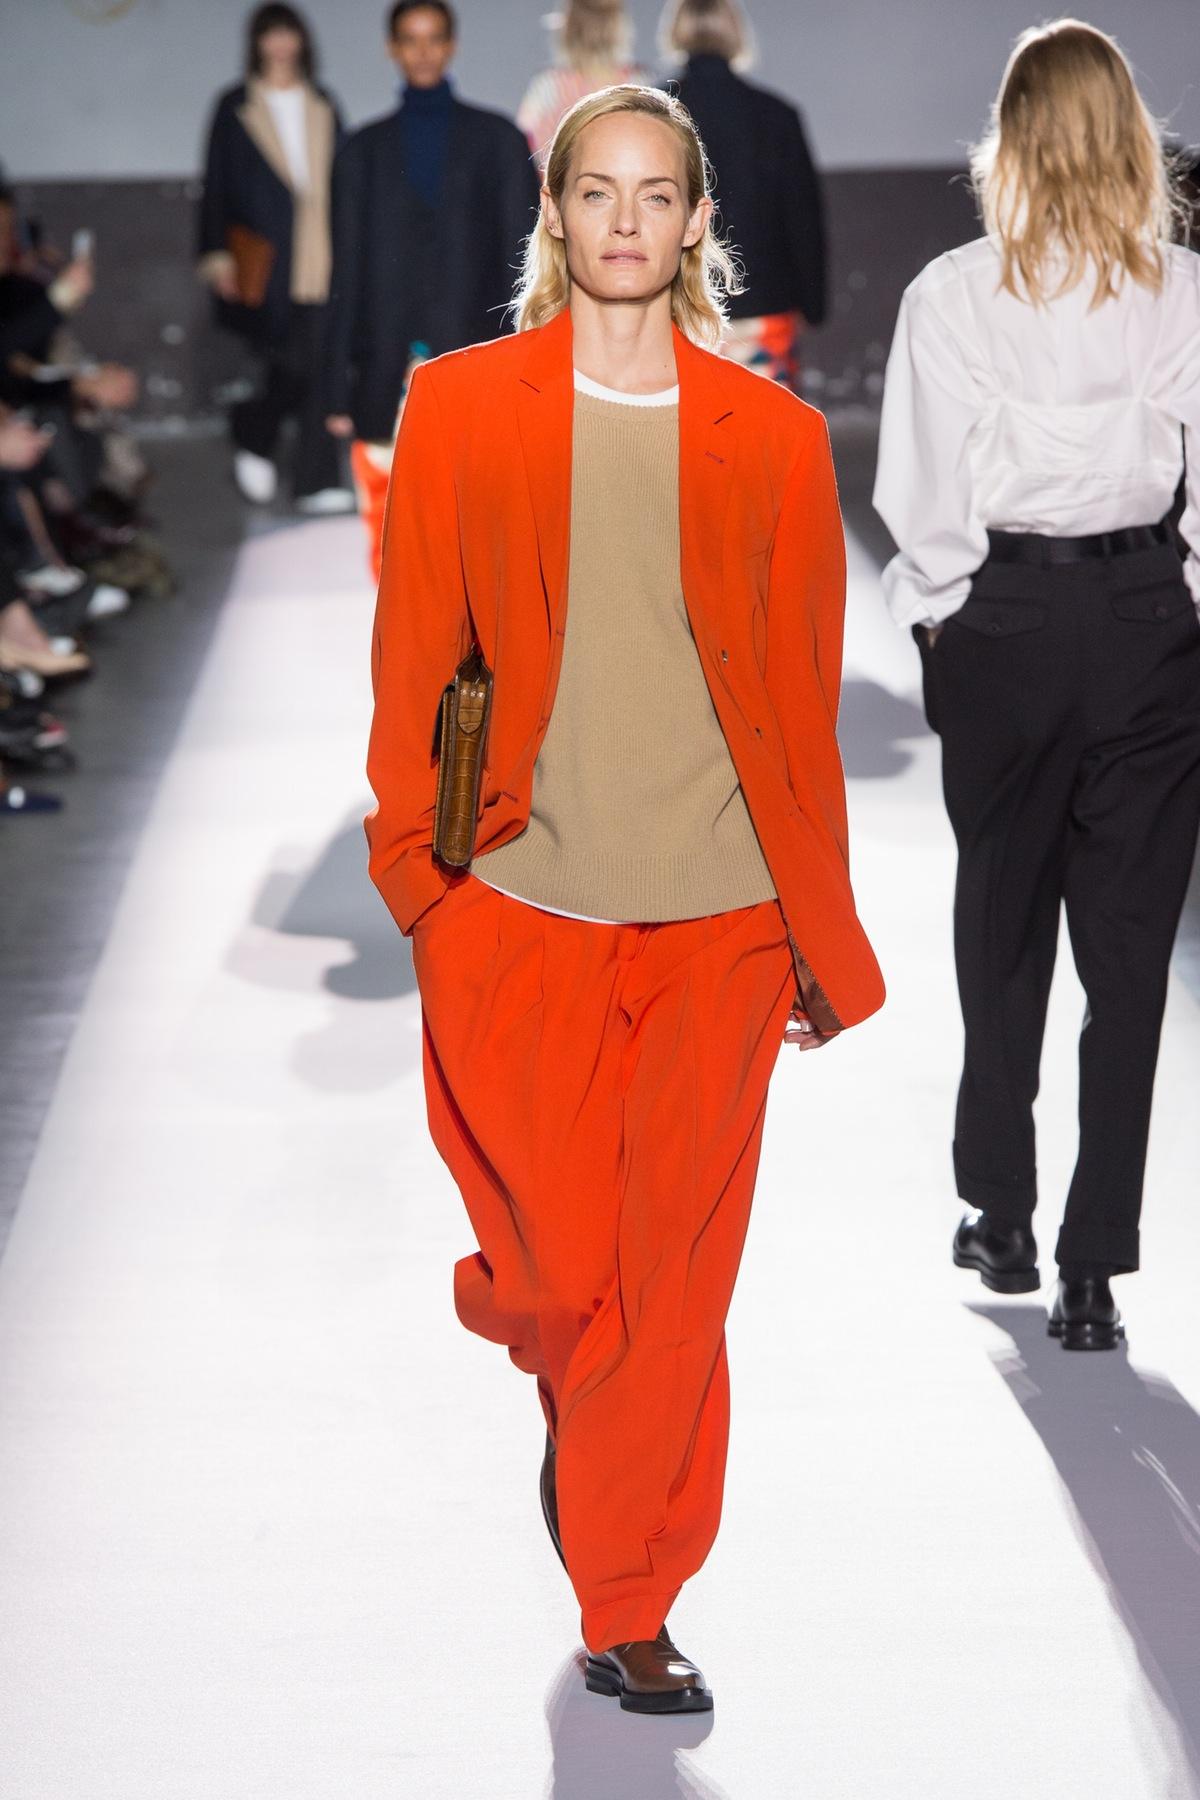 Dries Van Noten Autumn 2017, image via The Business Of Fashion